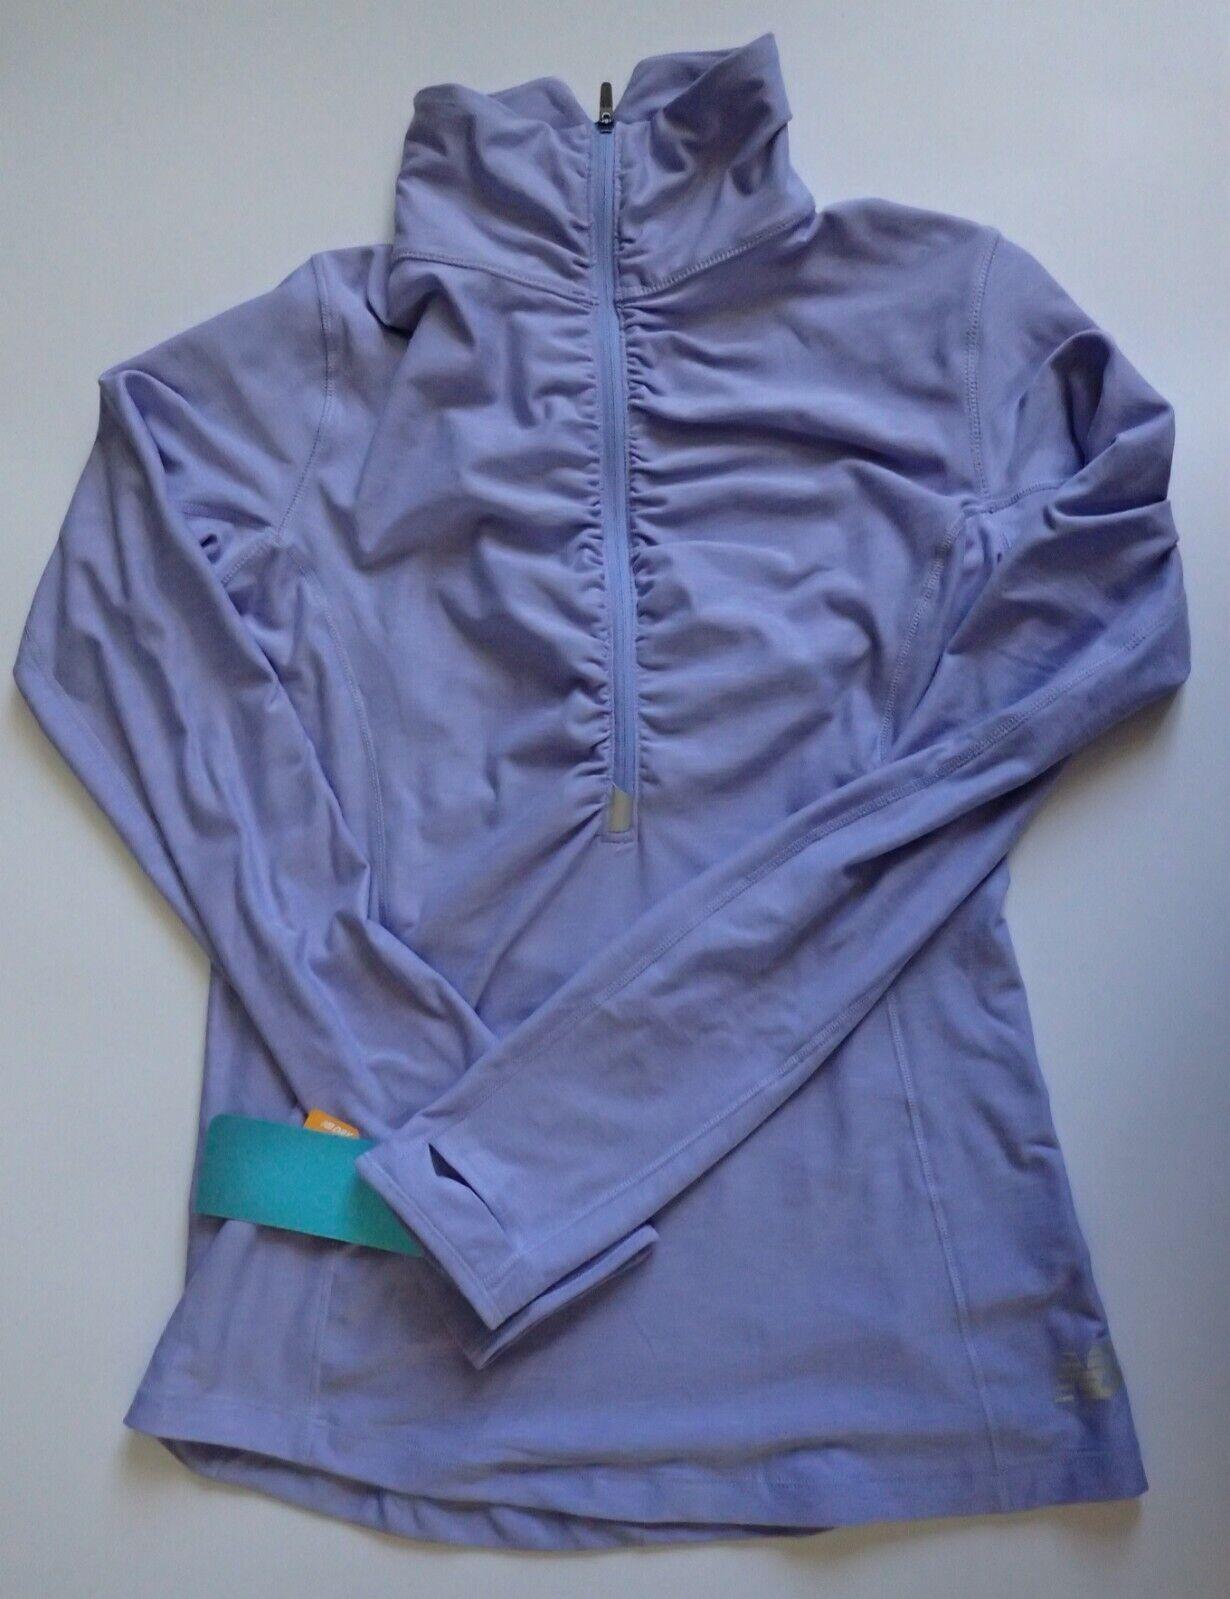 New Balance Lavender Long Sleeve S - New